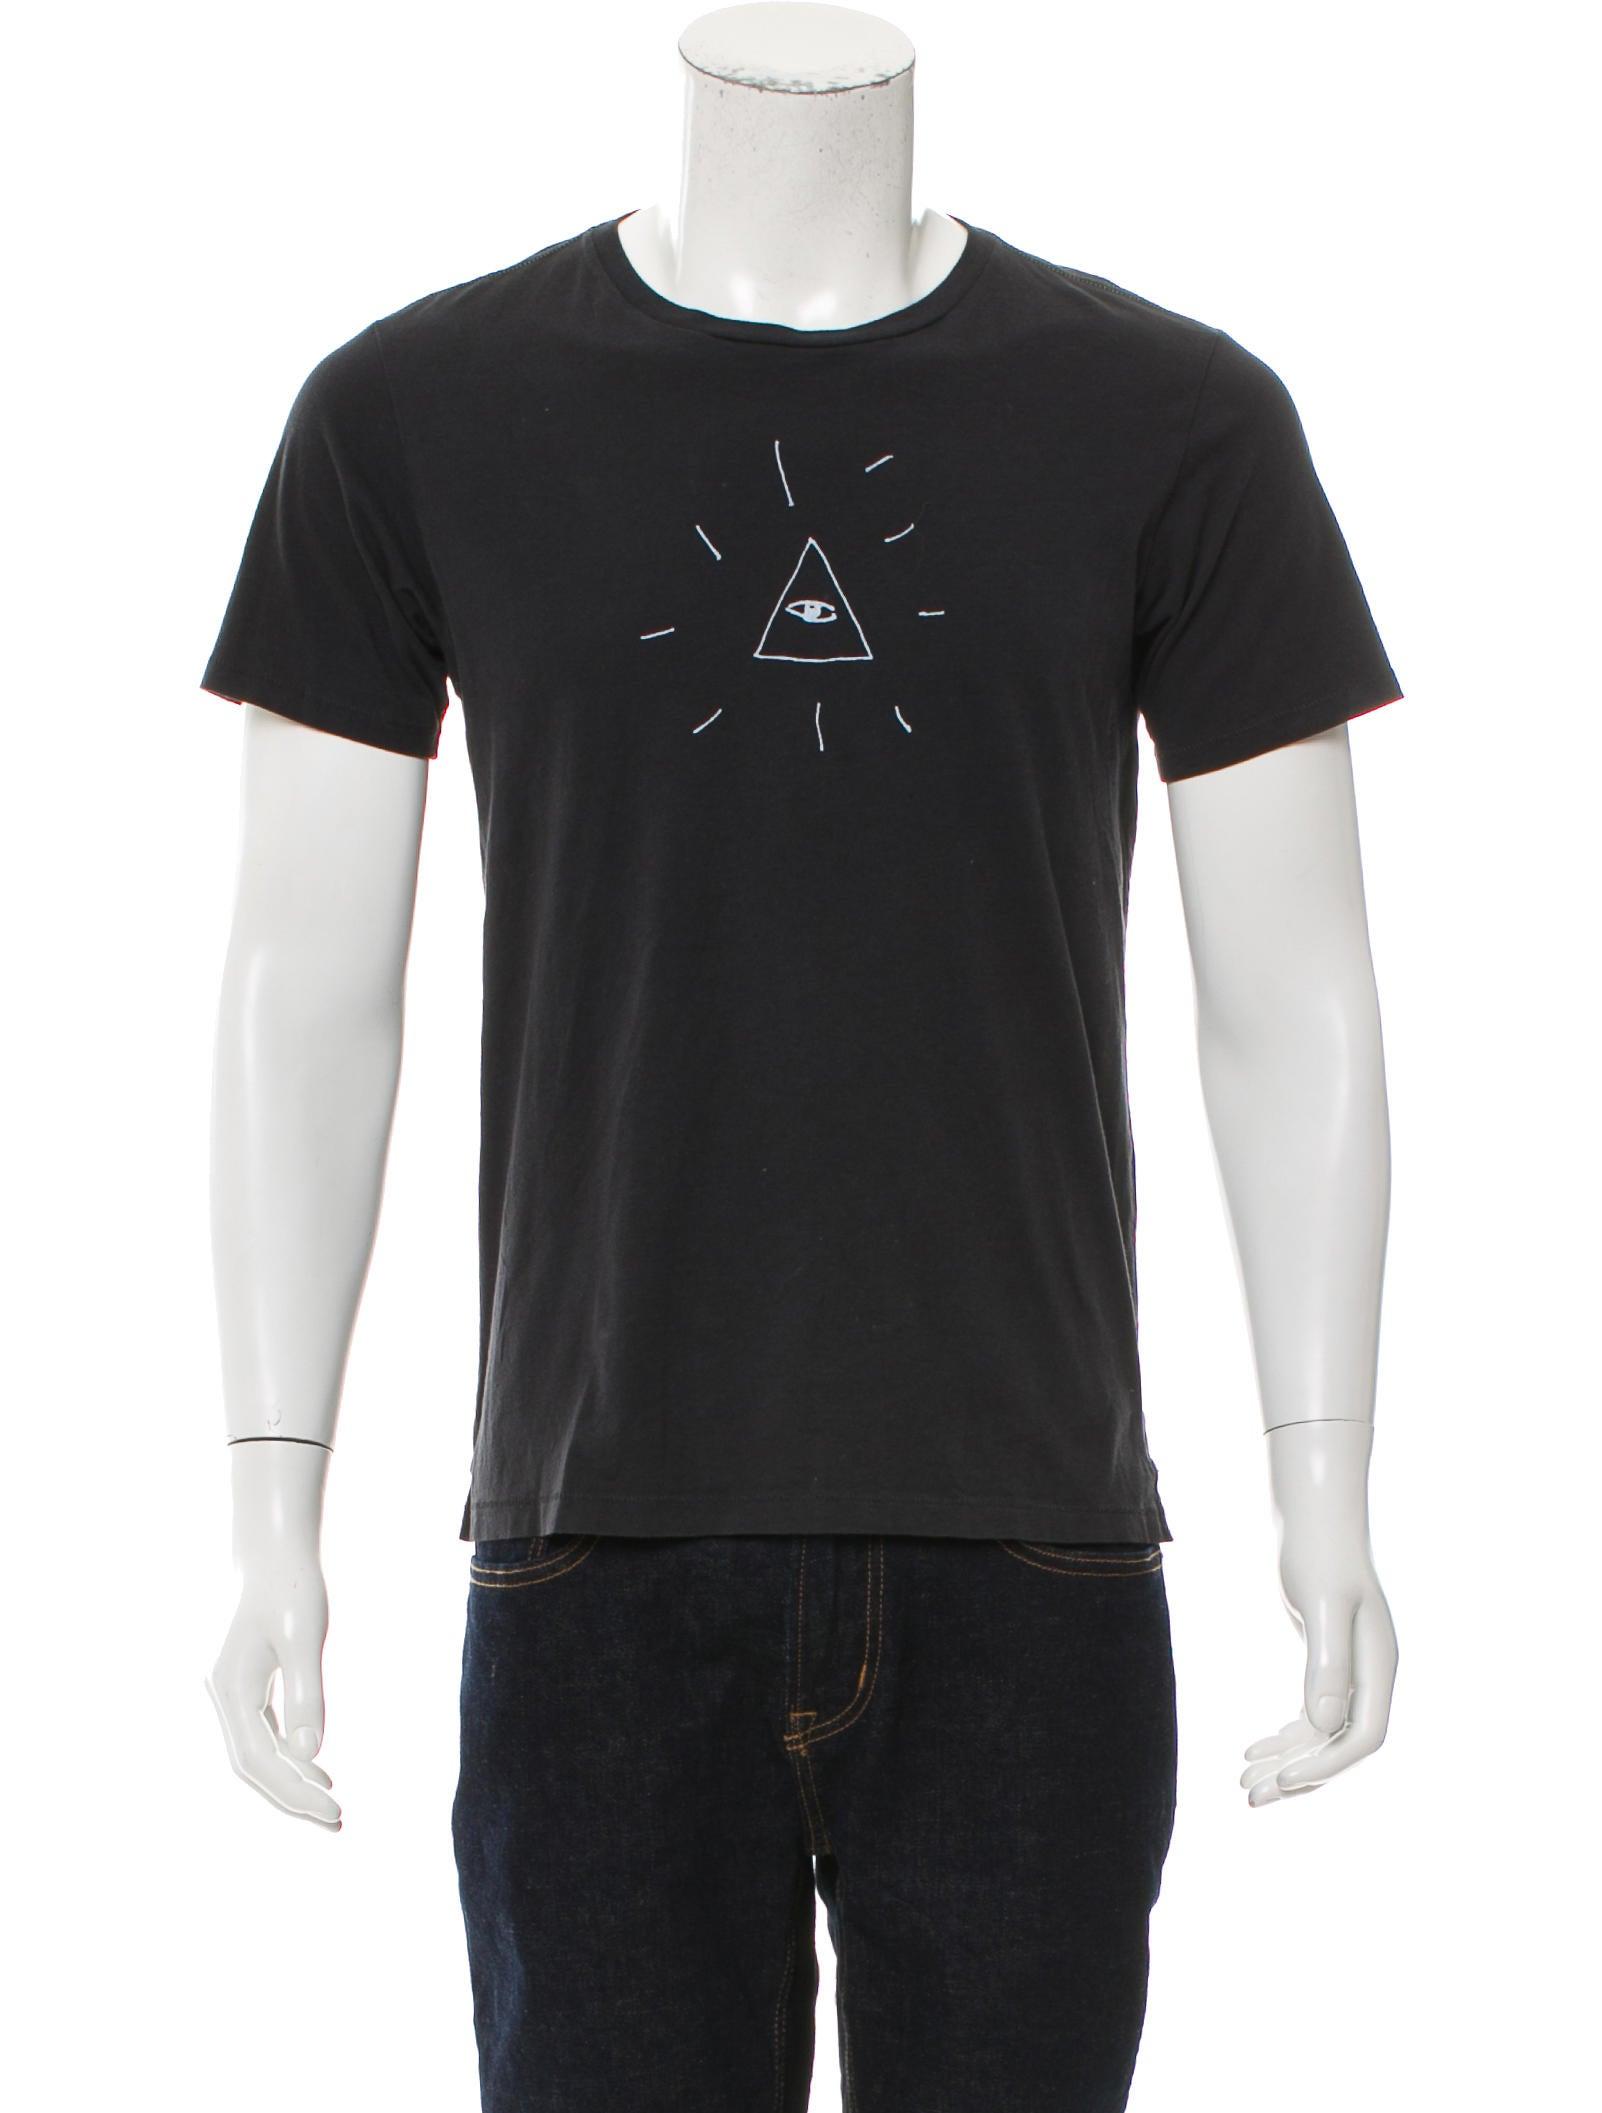 Rag Bone Graphic Print Crew Neck T Shirt Clothing